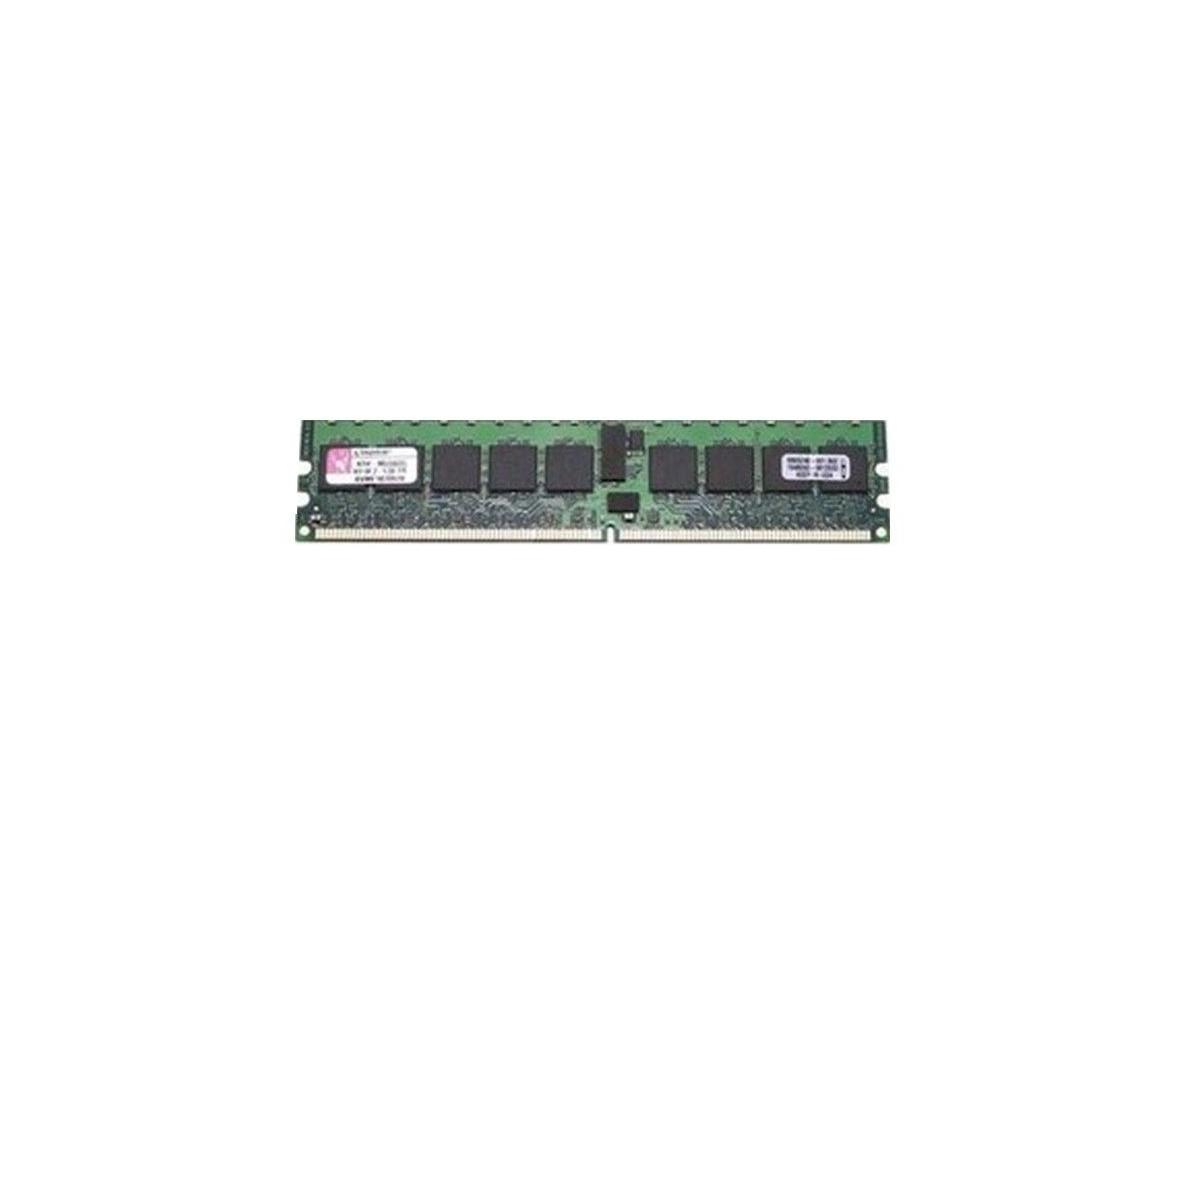 Kingston 4GB DDR2 800Mhz ECC REG KTH-BL495K2/8G